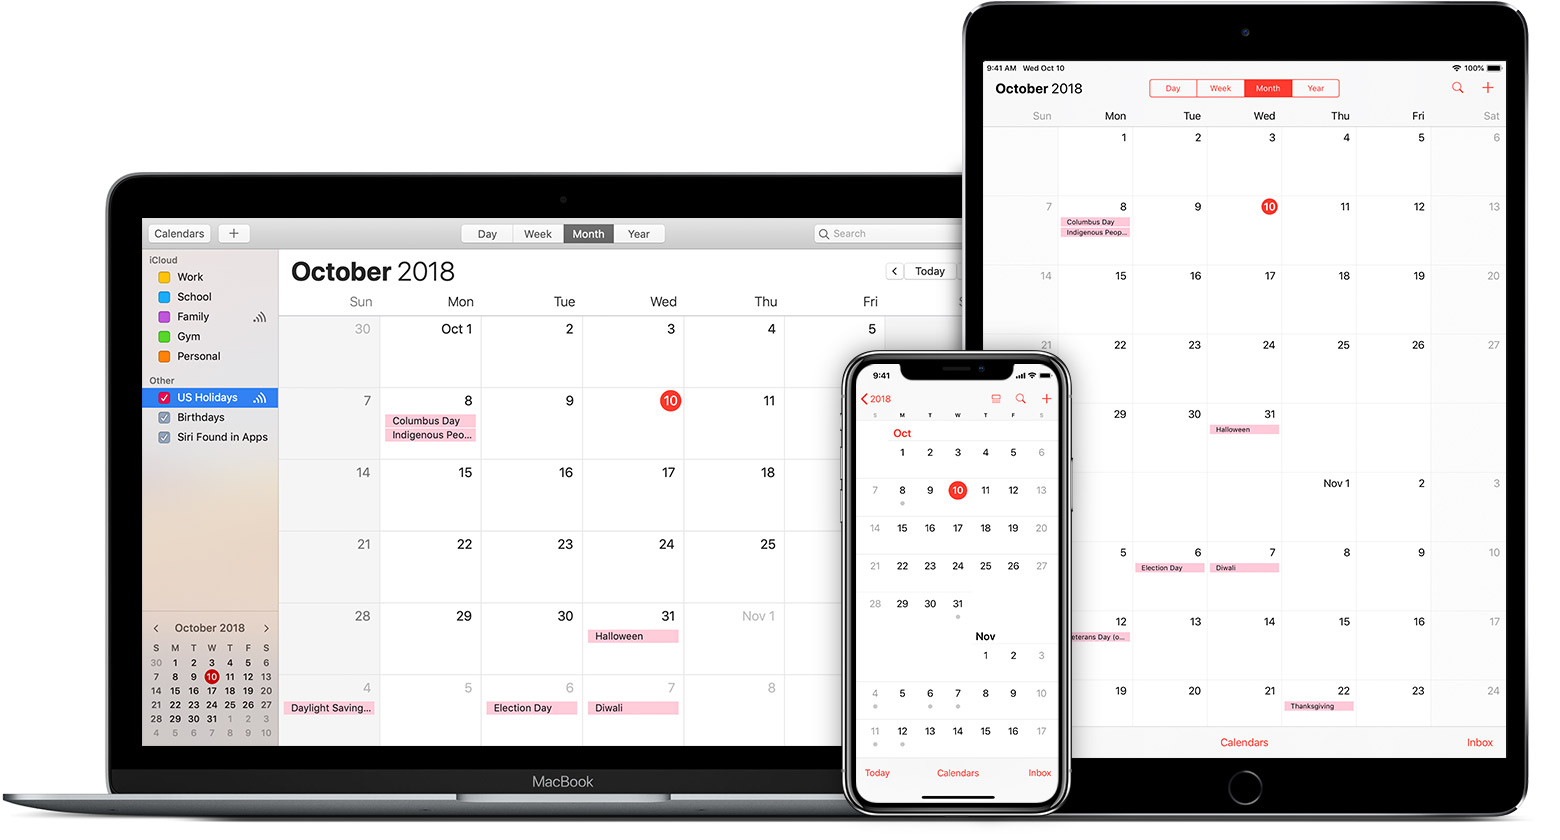 Best Apps Of 2019 To Best Organize Your Schedule | Techno FAQ